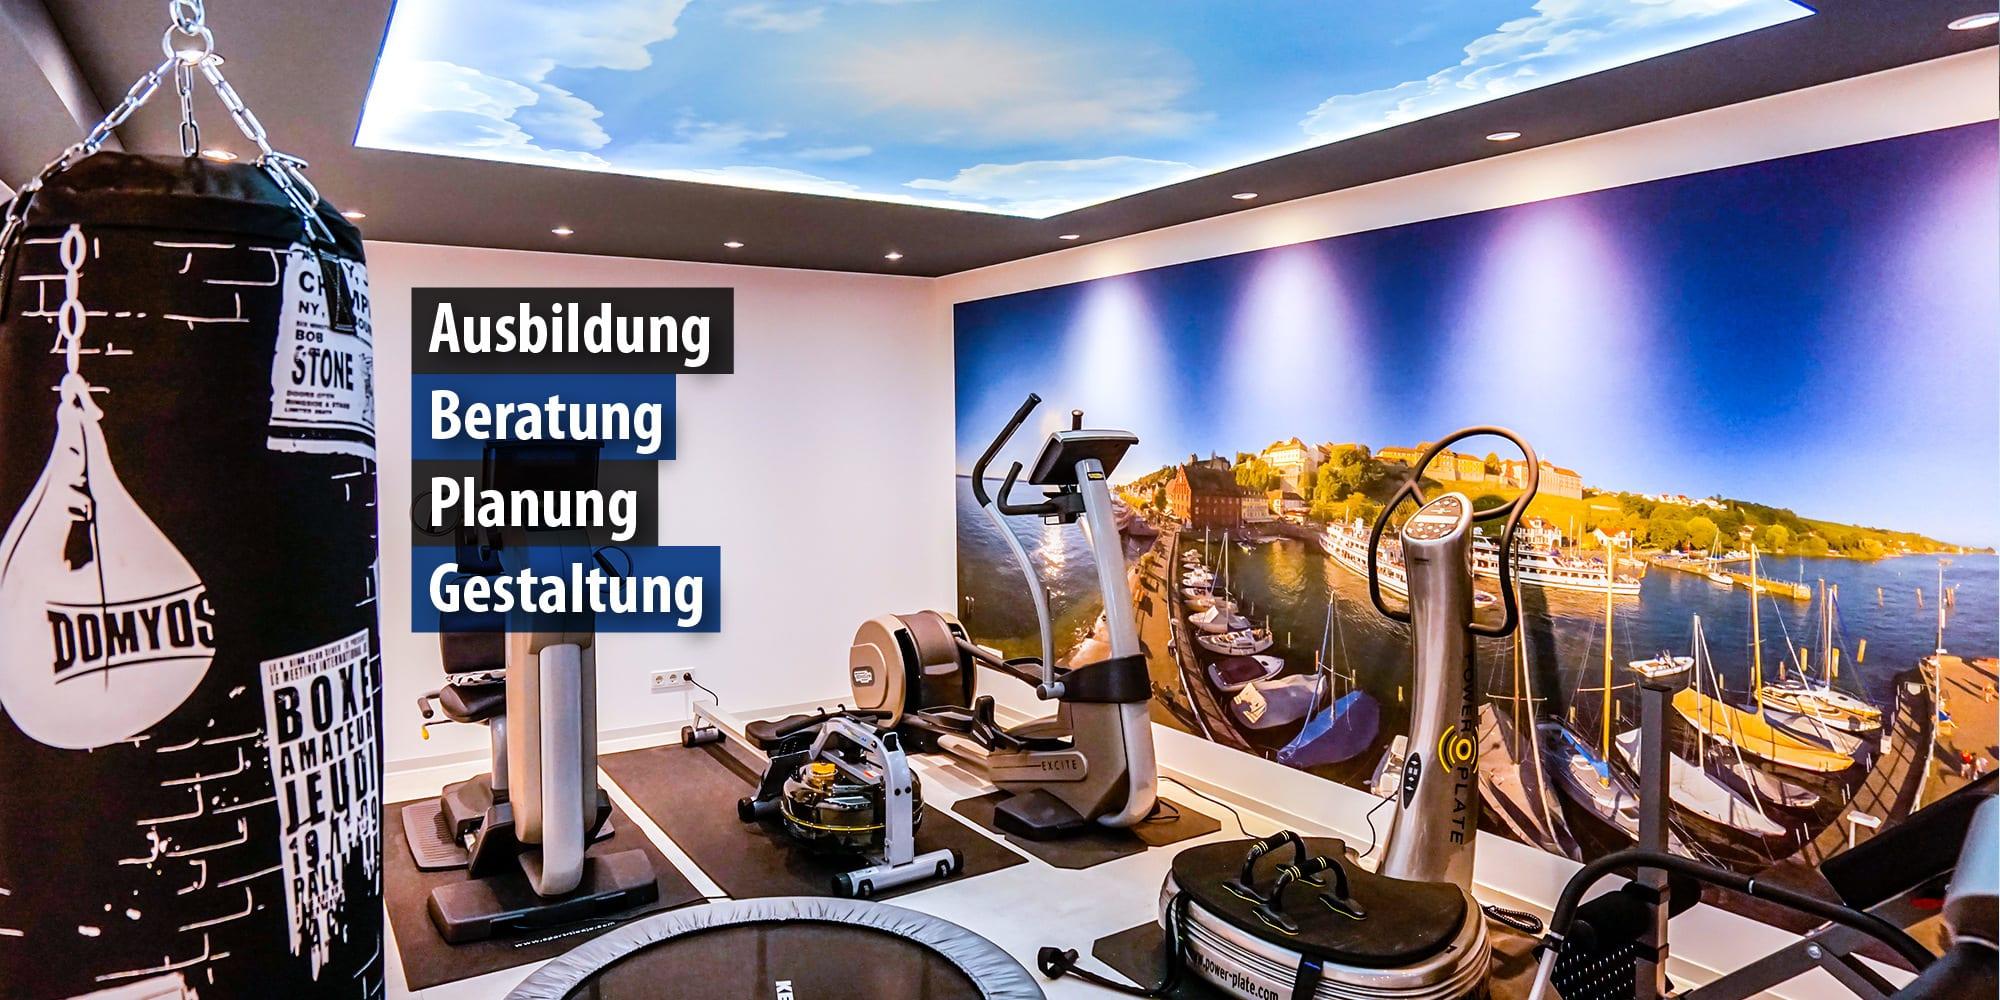 Lichtdecke im Fitnessstudio